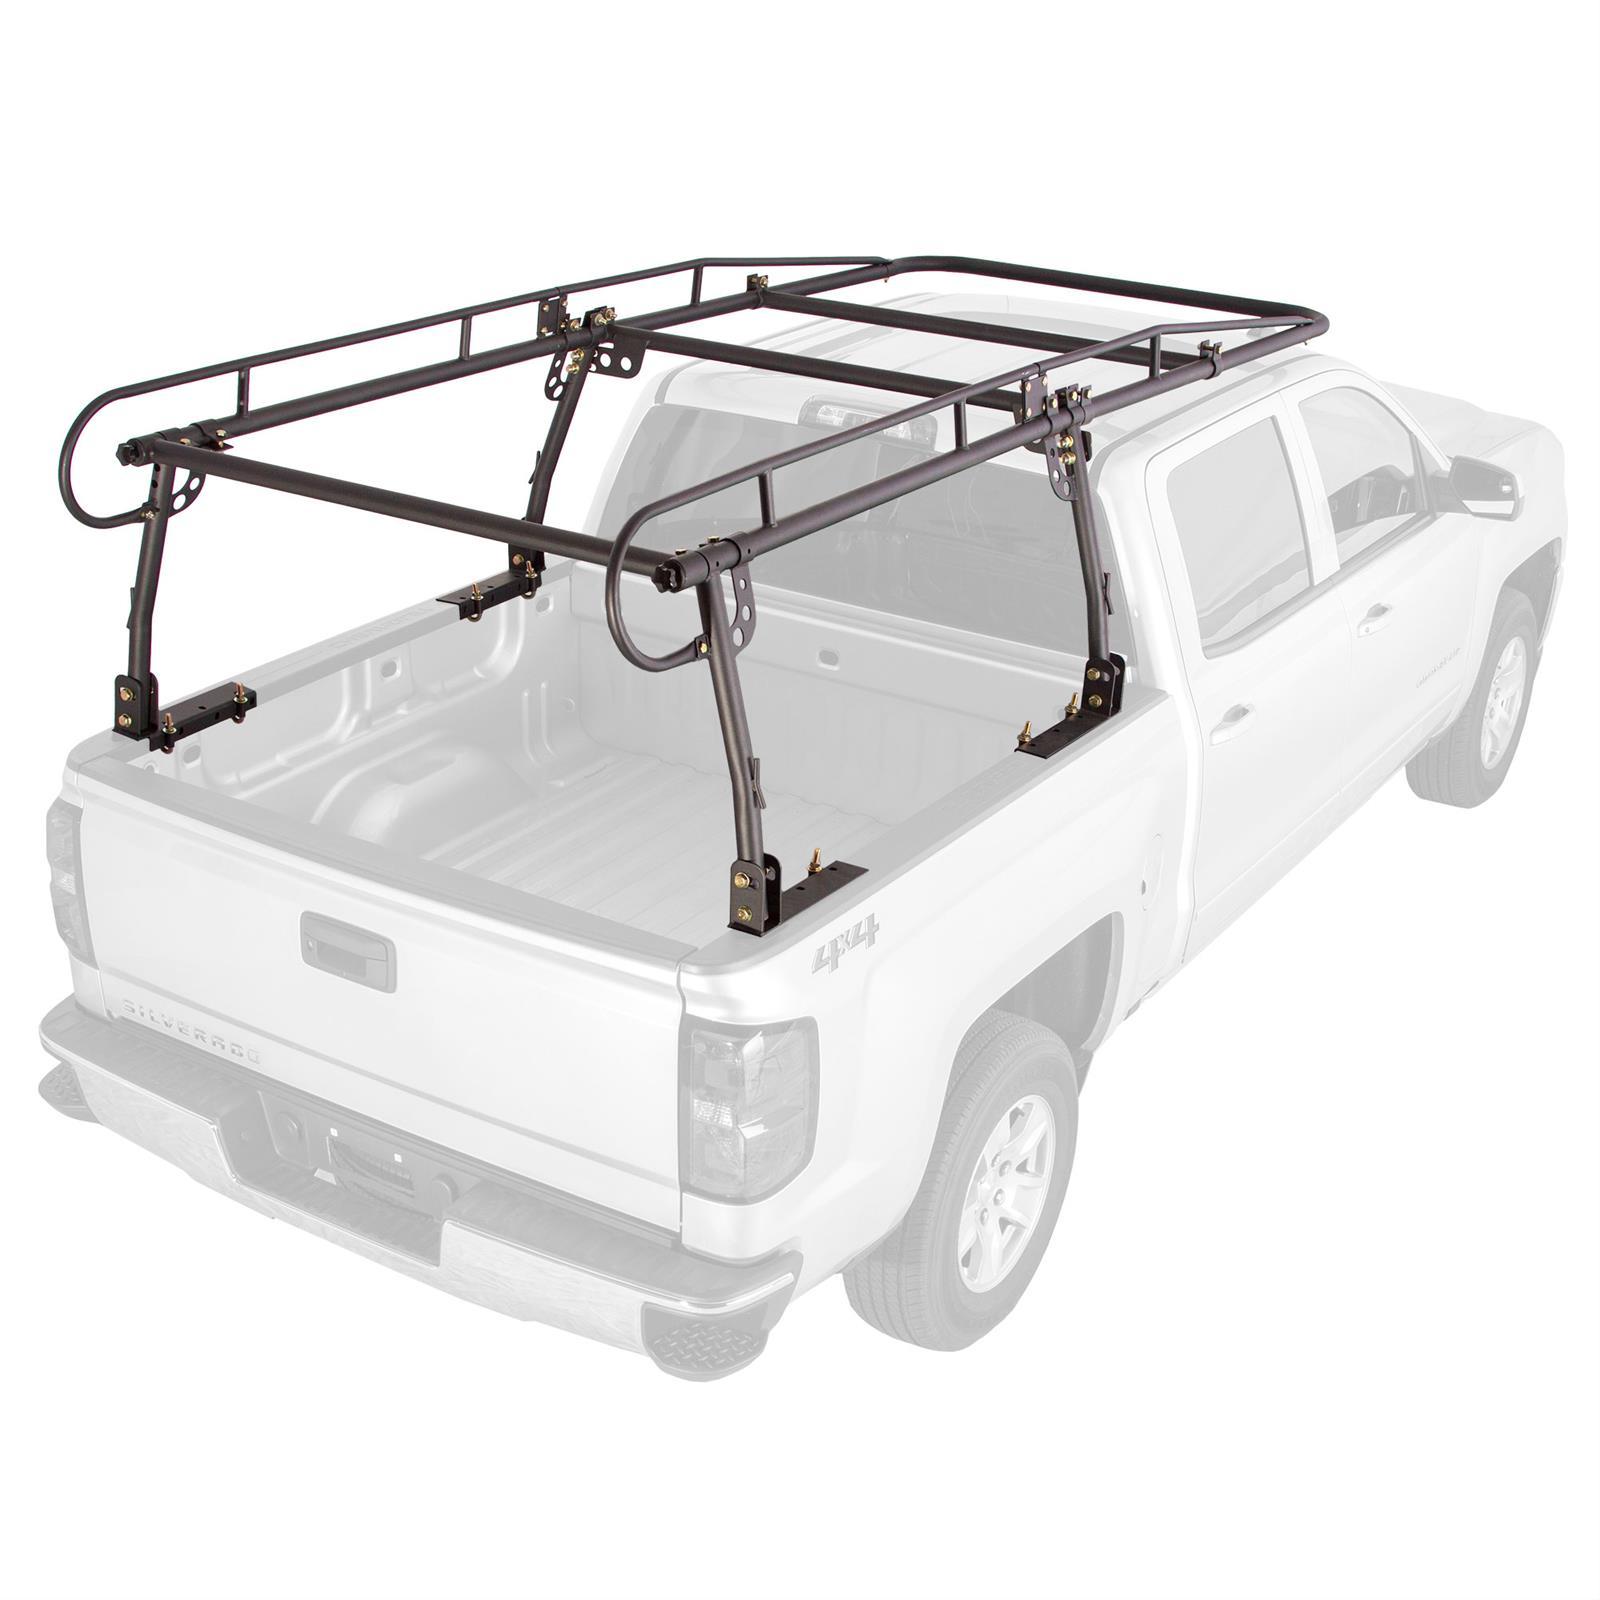 discount ramps uput rack v2 rage powersport apex universal truck racks summit racing